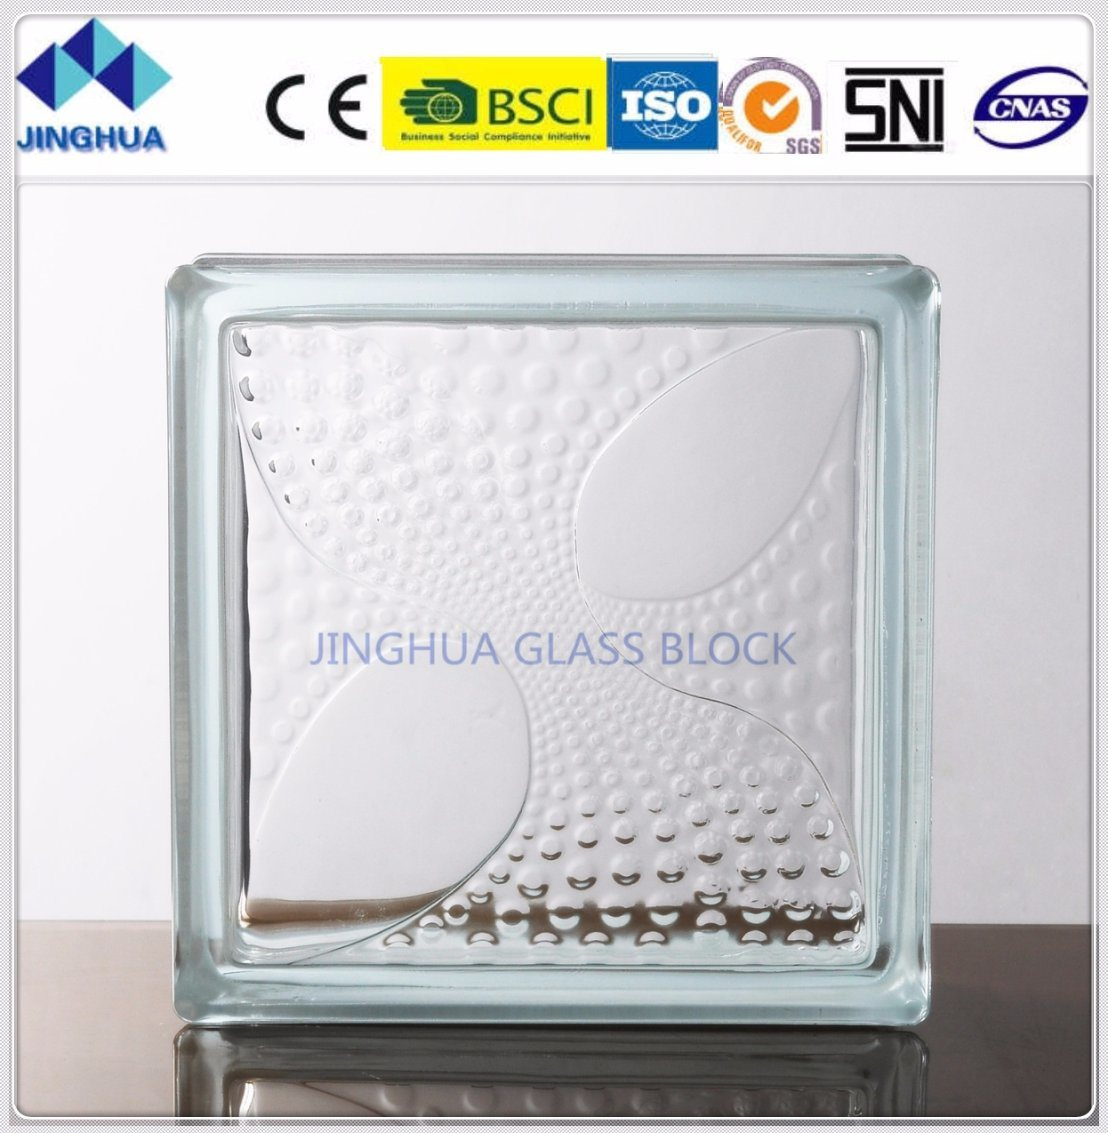 China Jinghua Glass Block Coral Clear 190x190x80mm Glass Brick Block China Glass Block Glass Brick Harga glass block 2021